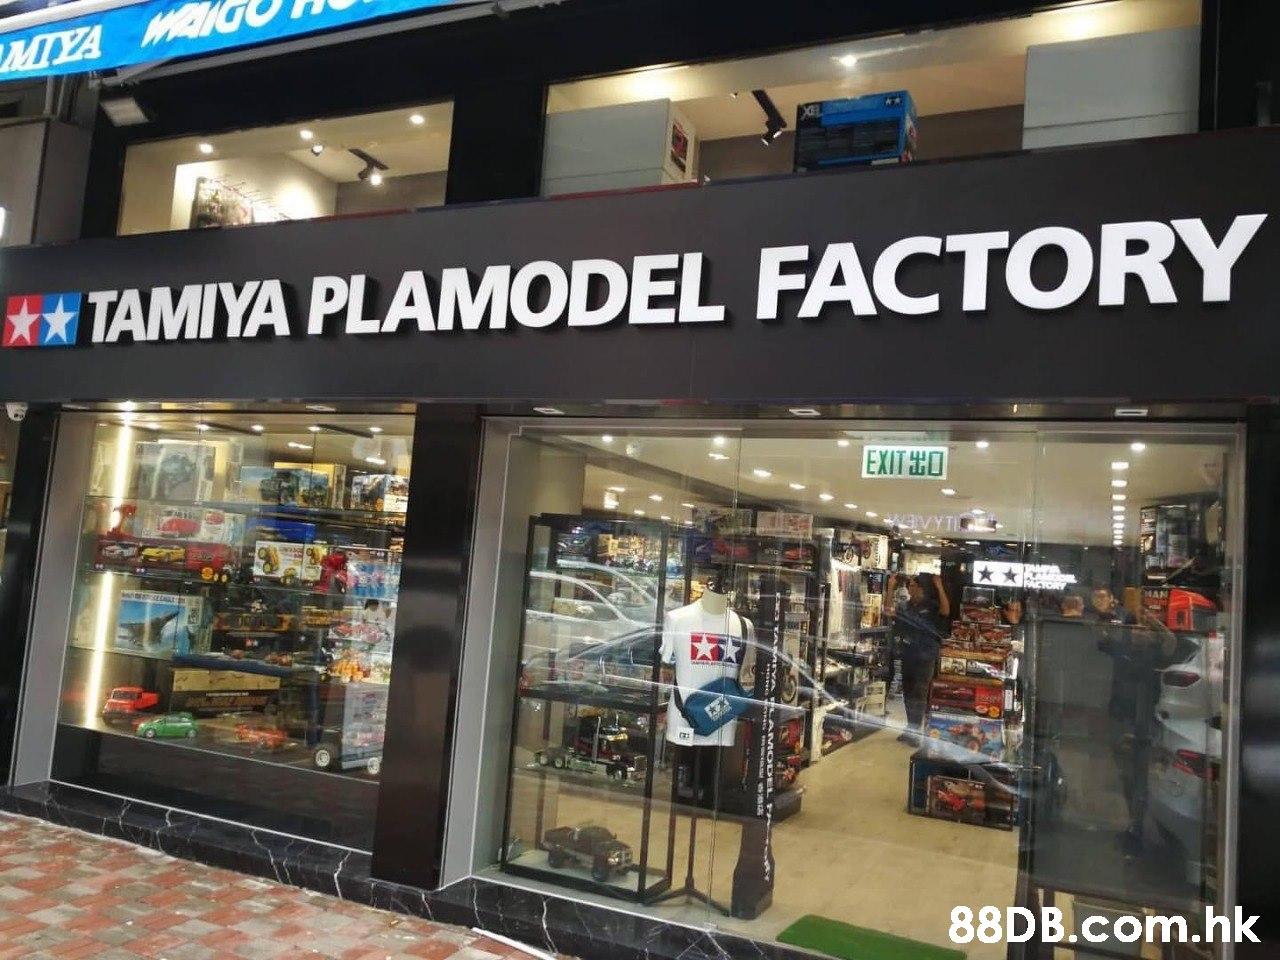 MIYA WA TAMIYA PLAMODEL FACTORY EXIT O EVY TI .hk  Building,Retail,Product,Outlet store,Shopping mall